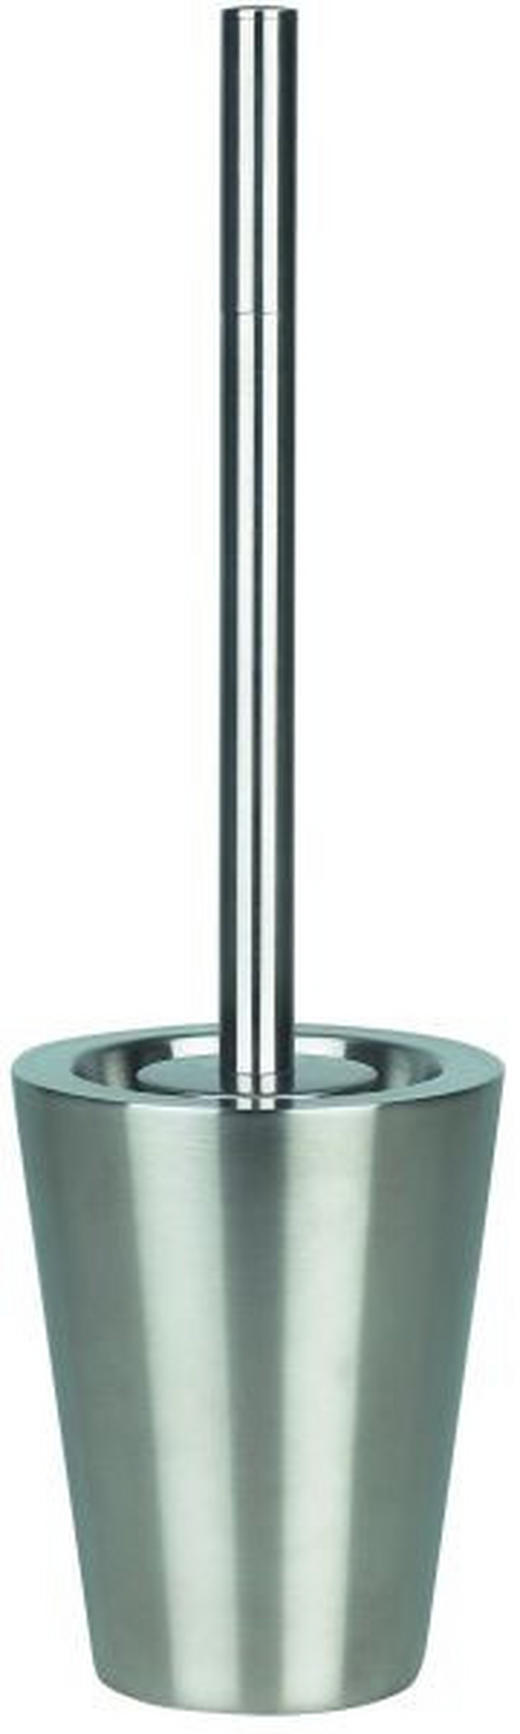 WC-BÜRSTENGARNITUR - Basics (12/40cm) - SPIRELLA